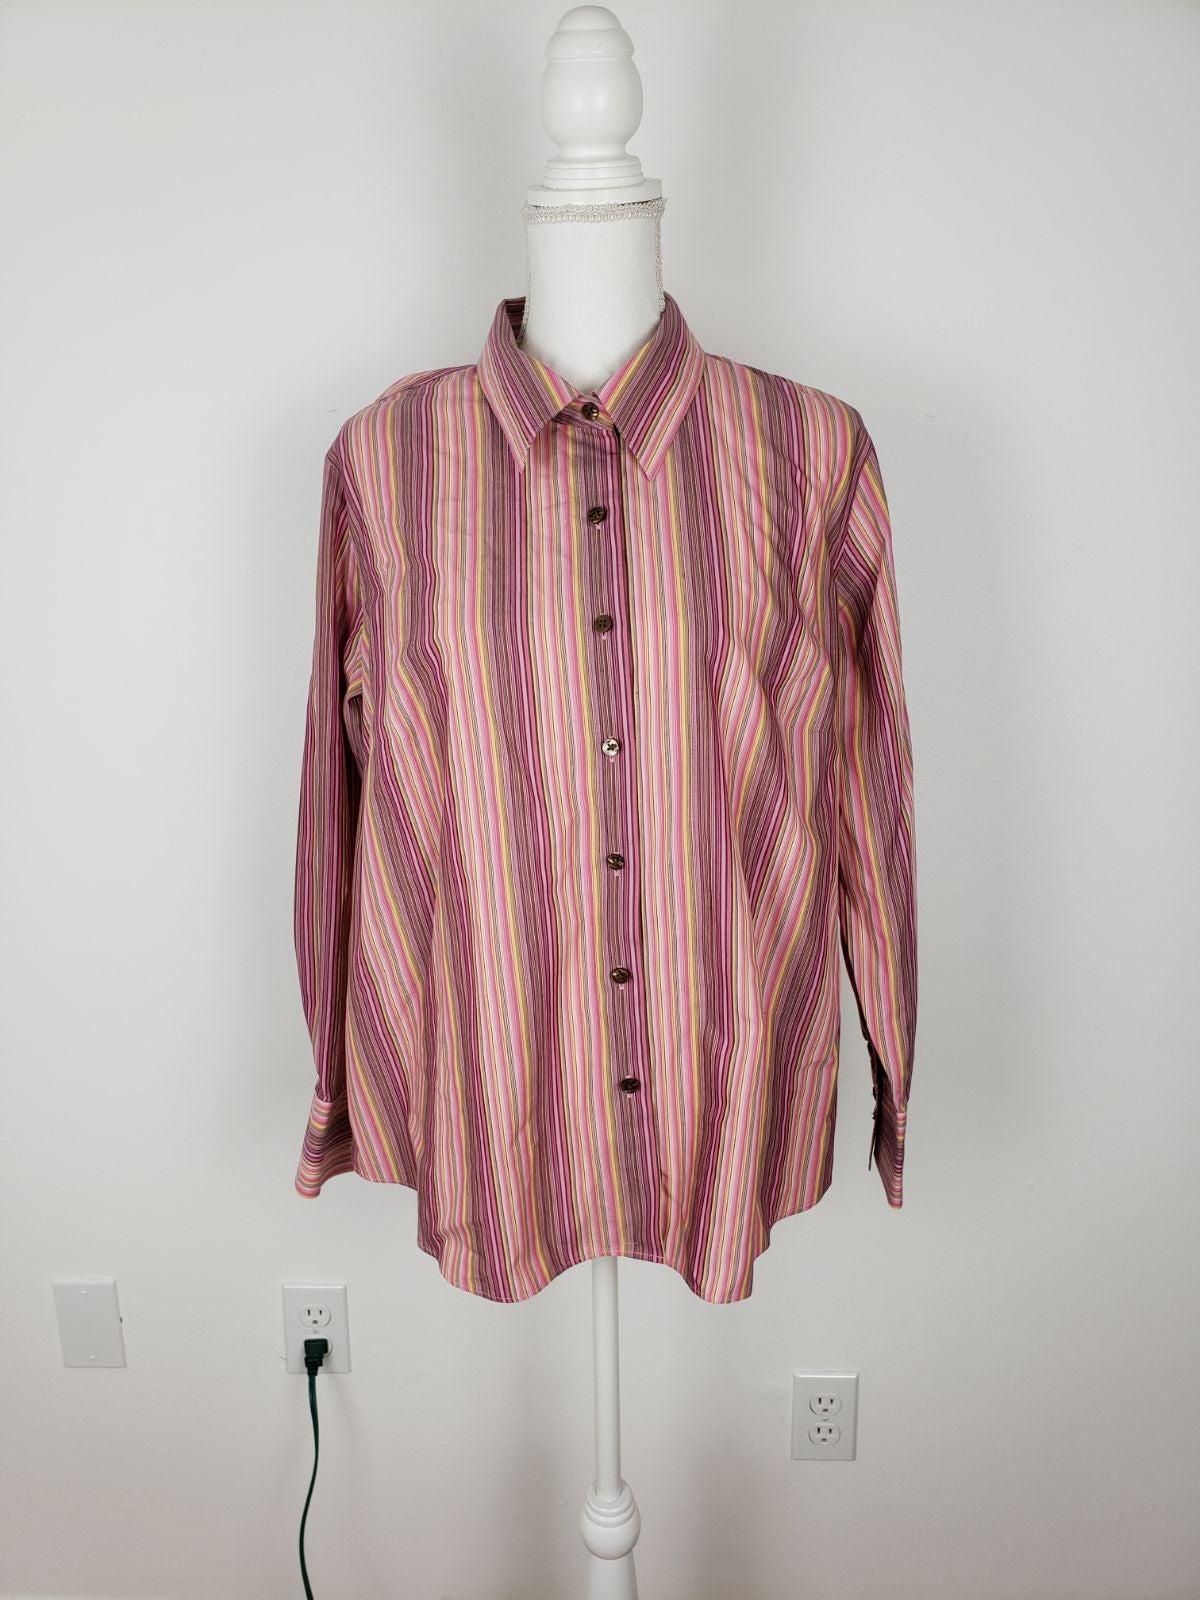 Talbots Women's Pink Striped Blouse